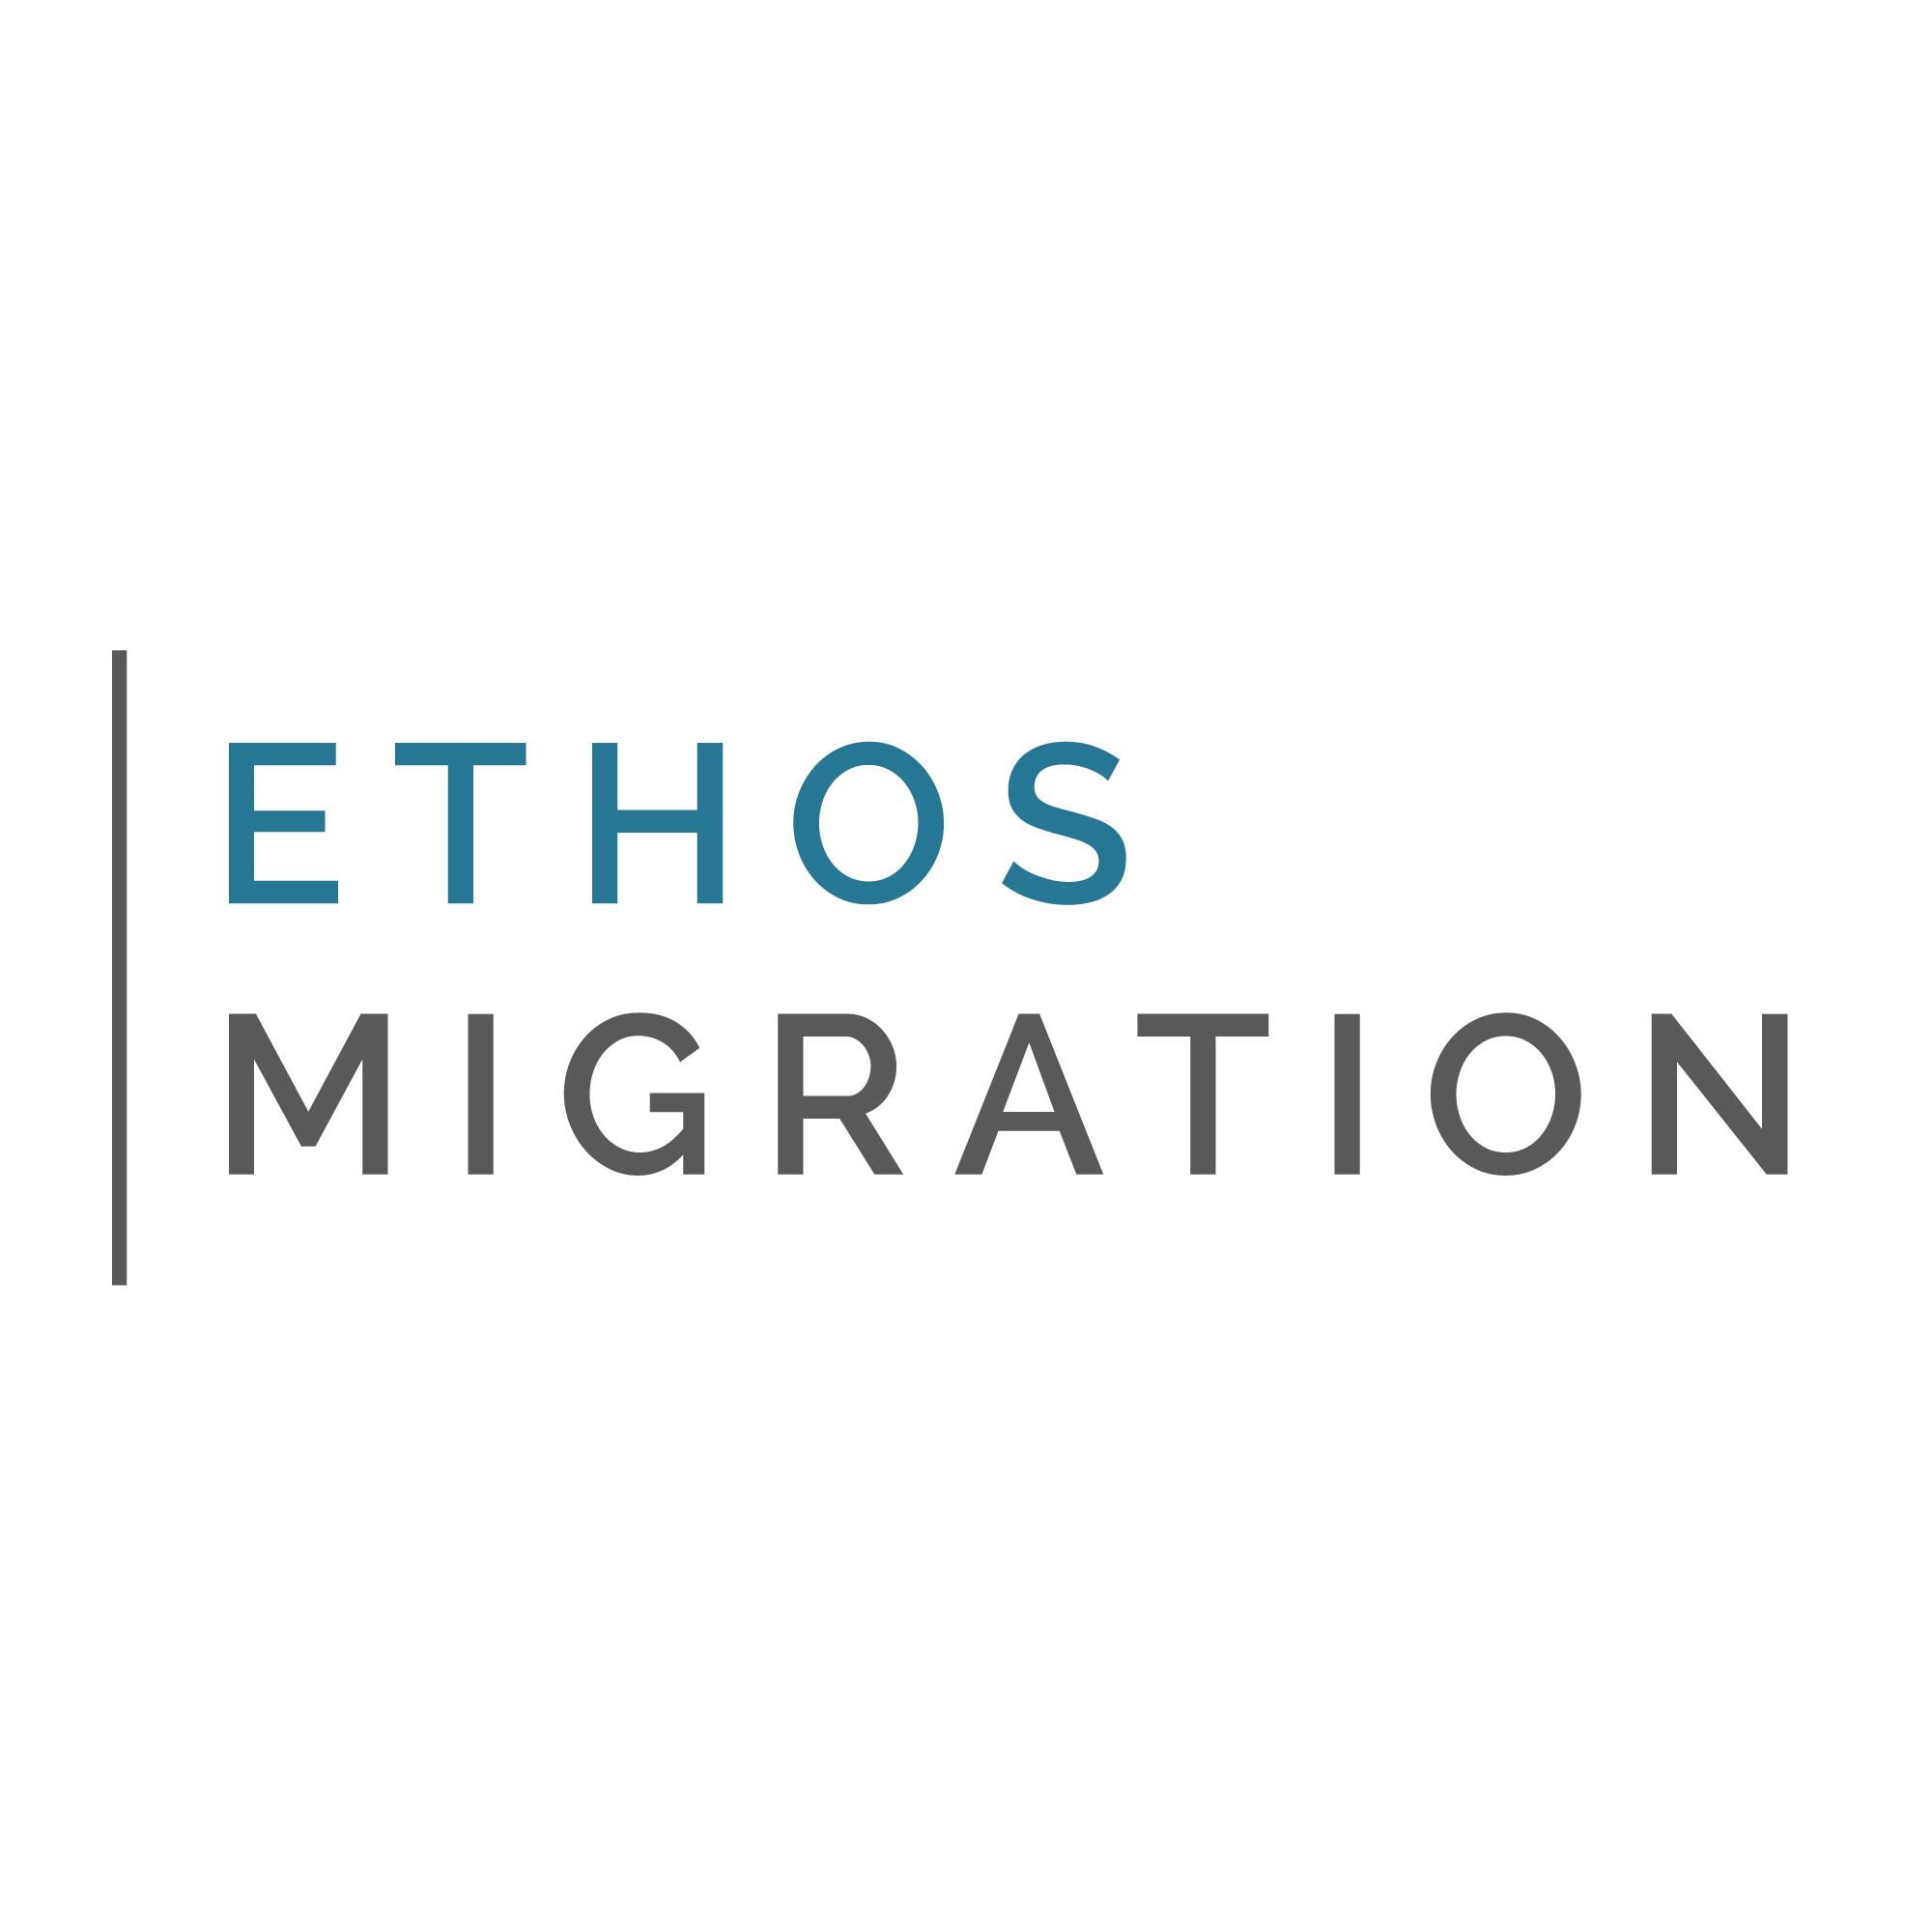 Ethos Migration